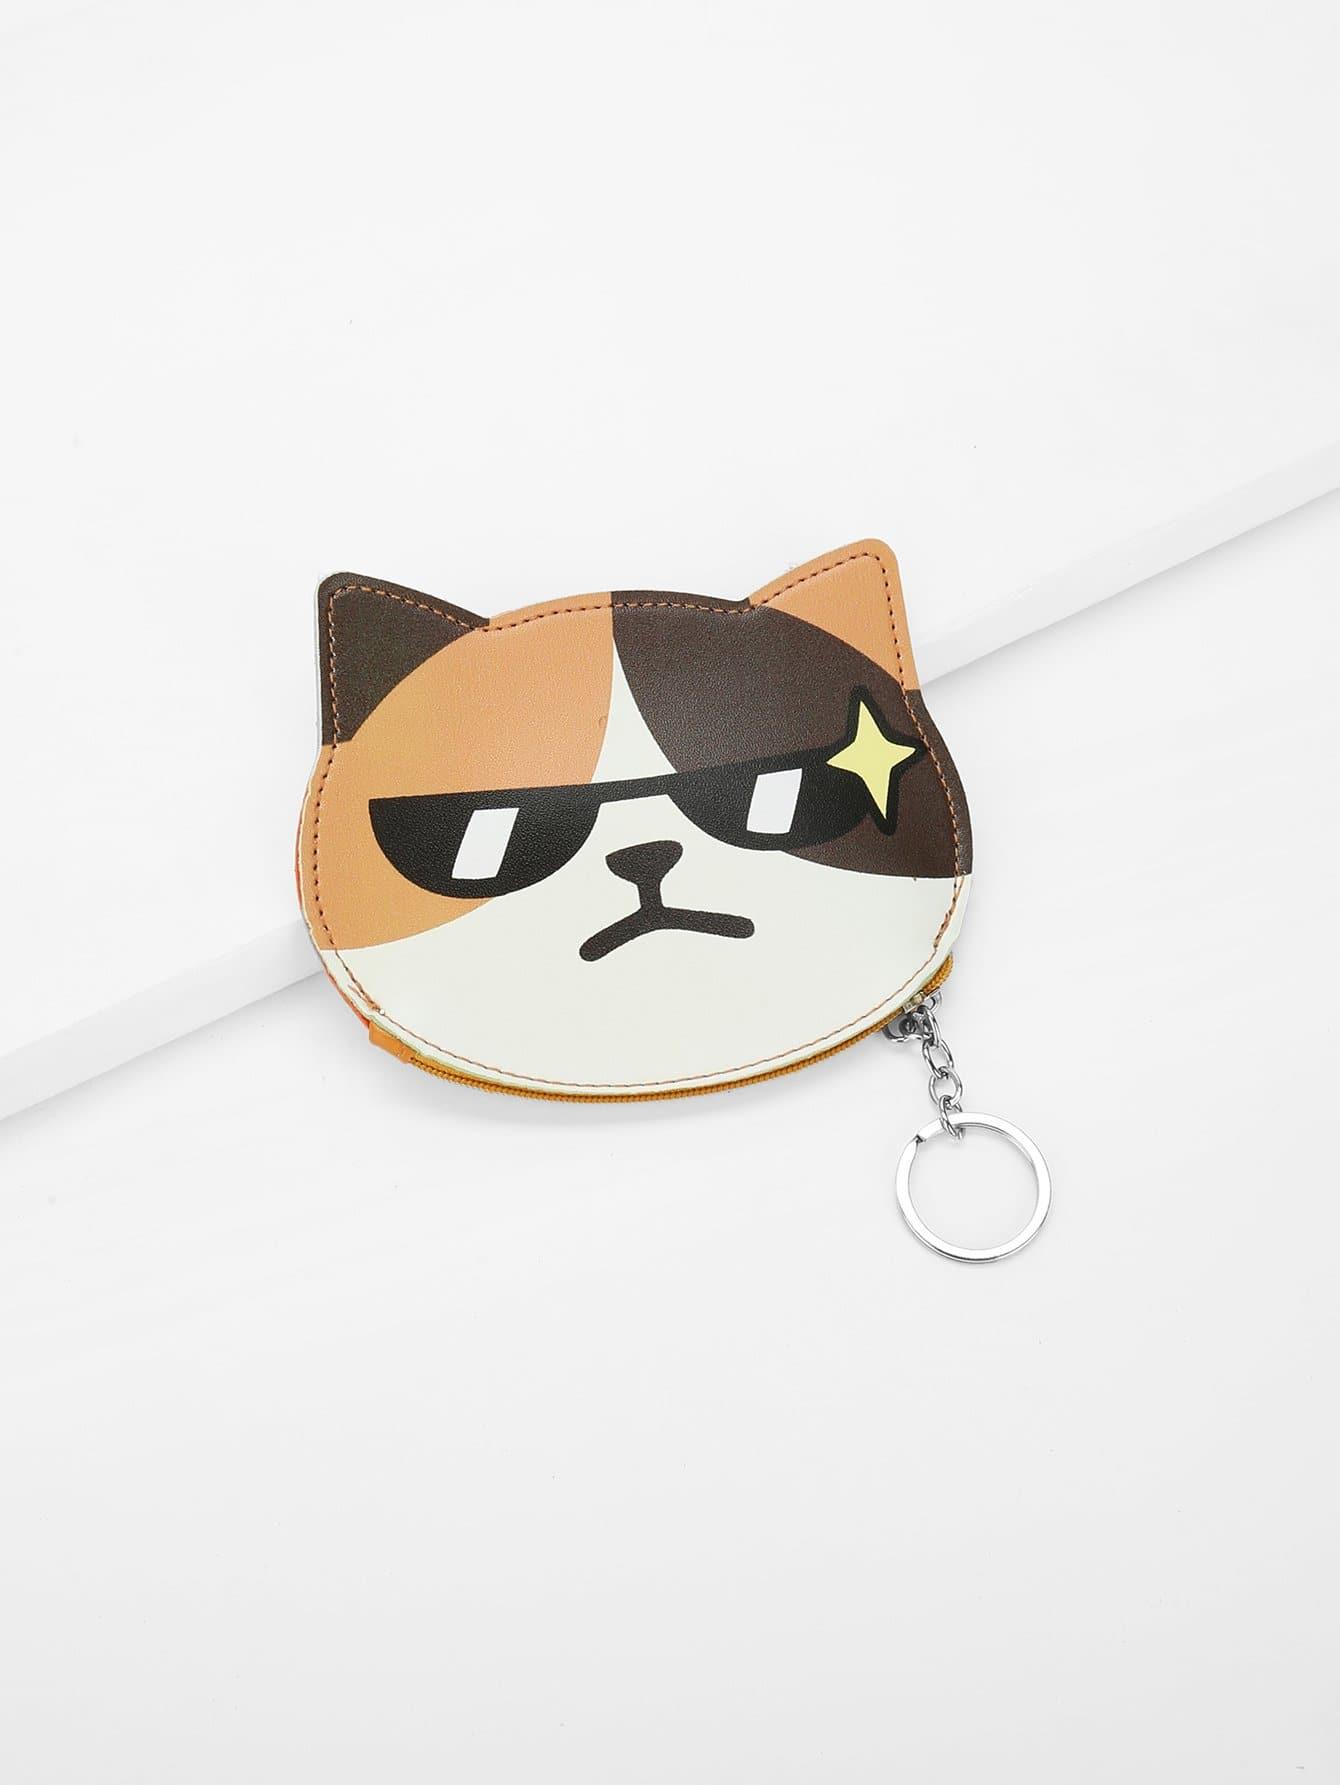 Cat Face Coin Purse 3d girl wallet bag ladies face zipper mini cat coin purses dog children purse plush bolsa de moeda coins pouch monedero gato